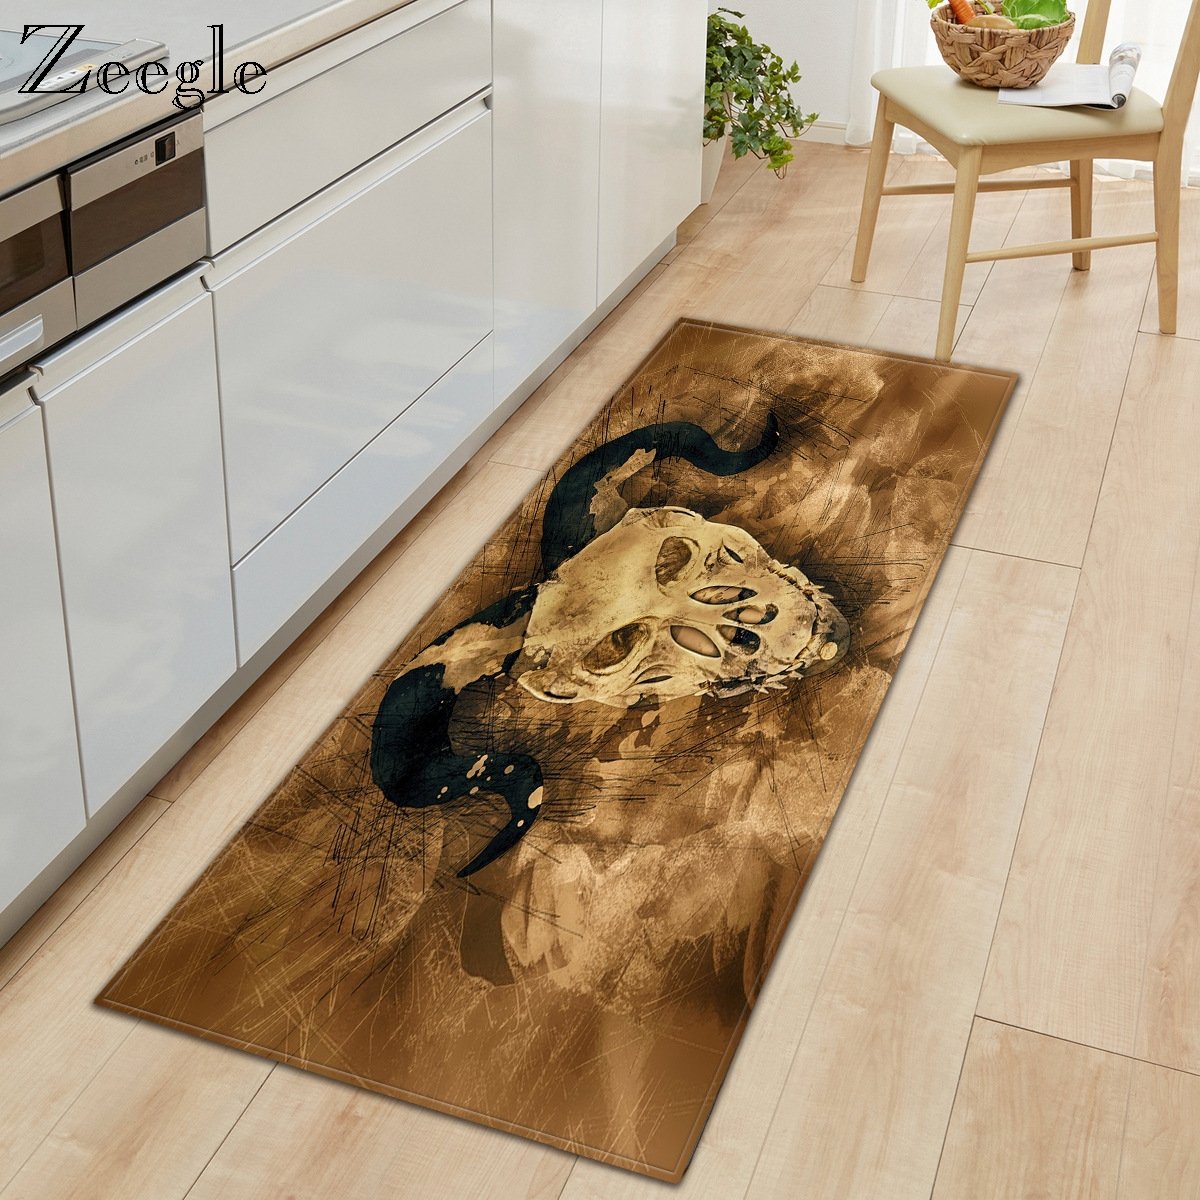 Zeegle Carpet Anti-slip Kitchen Rug Living Room Decoration Floor Rug Absorbent Bathroom Doormat Shower Mat Bedside Carpet Mat